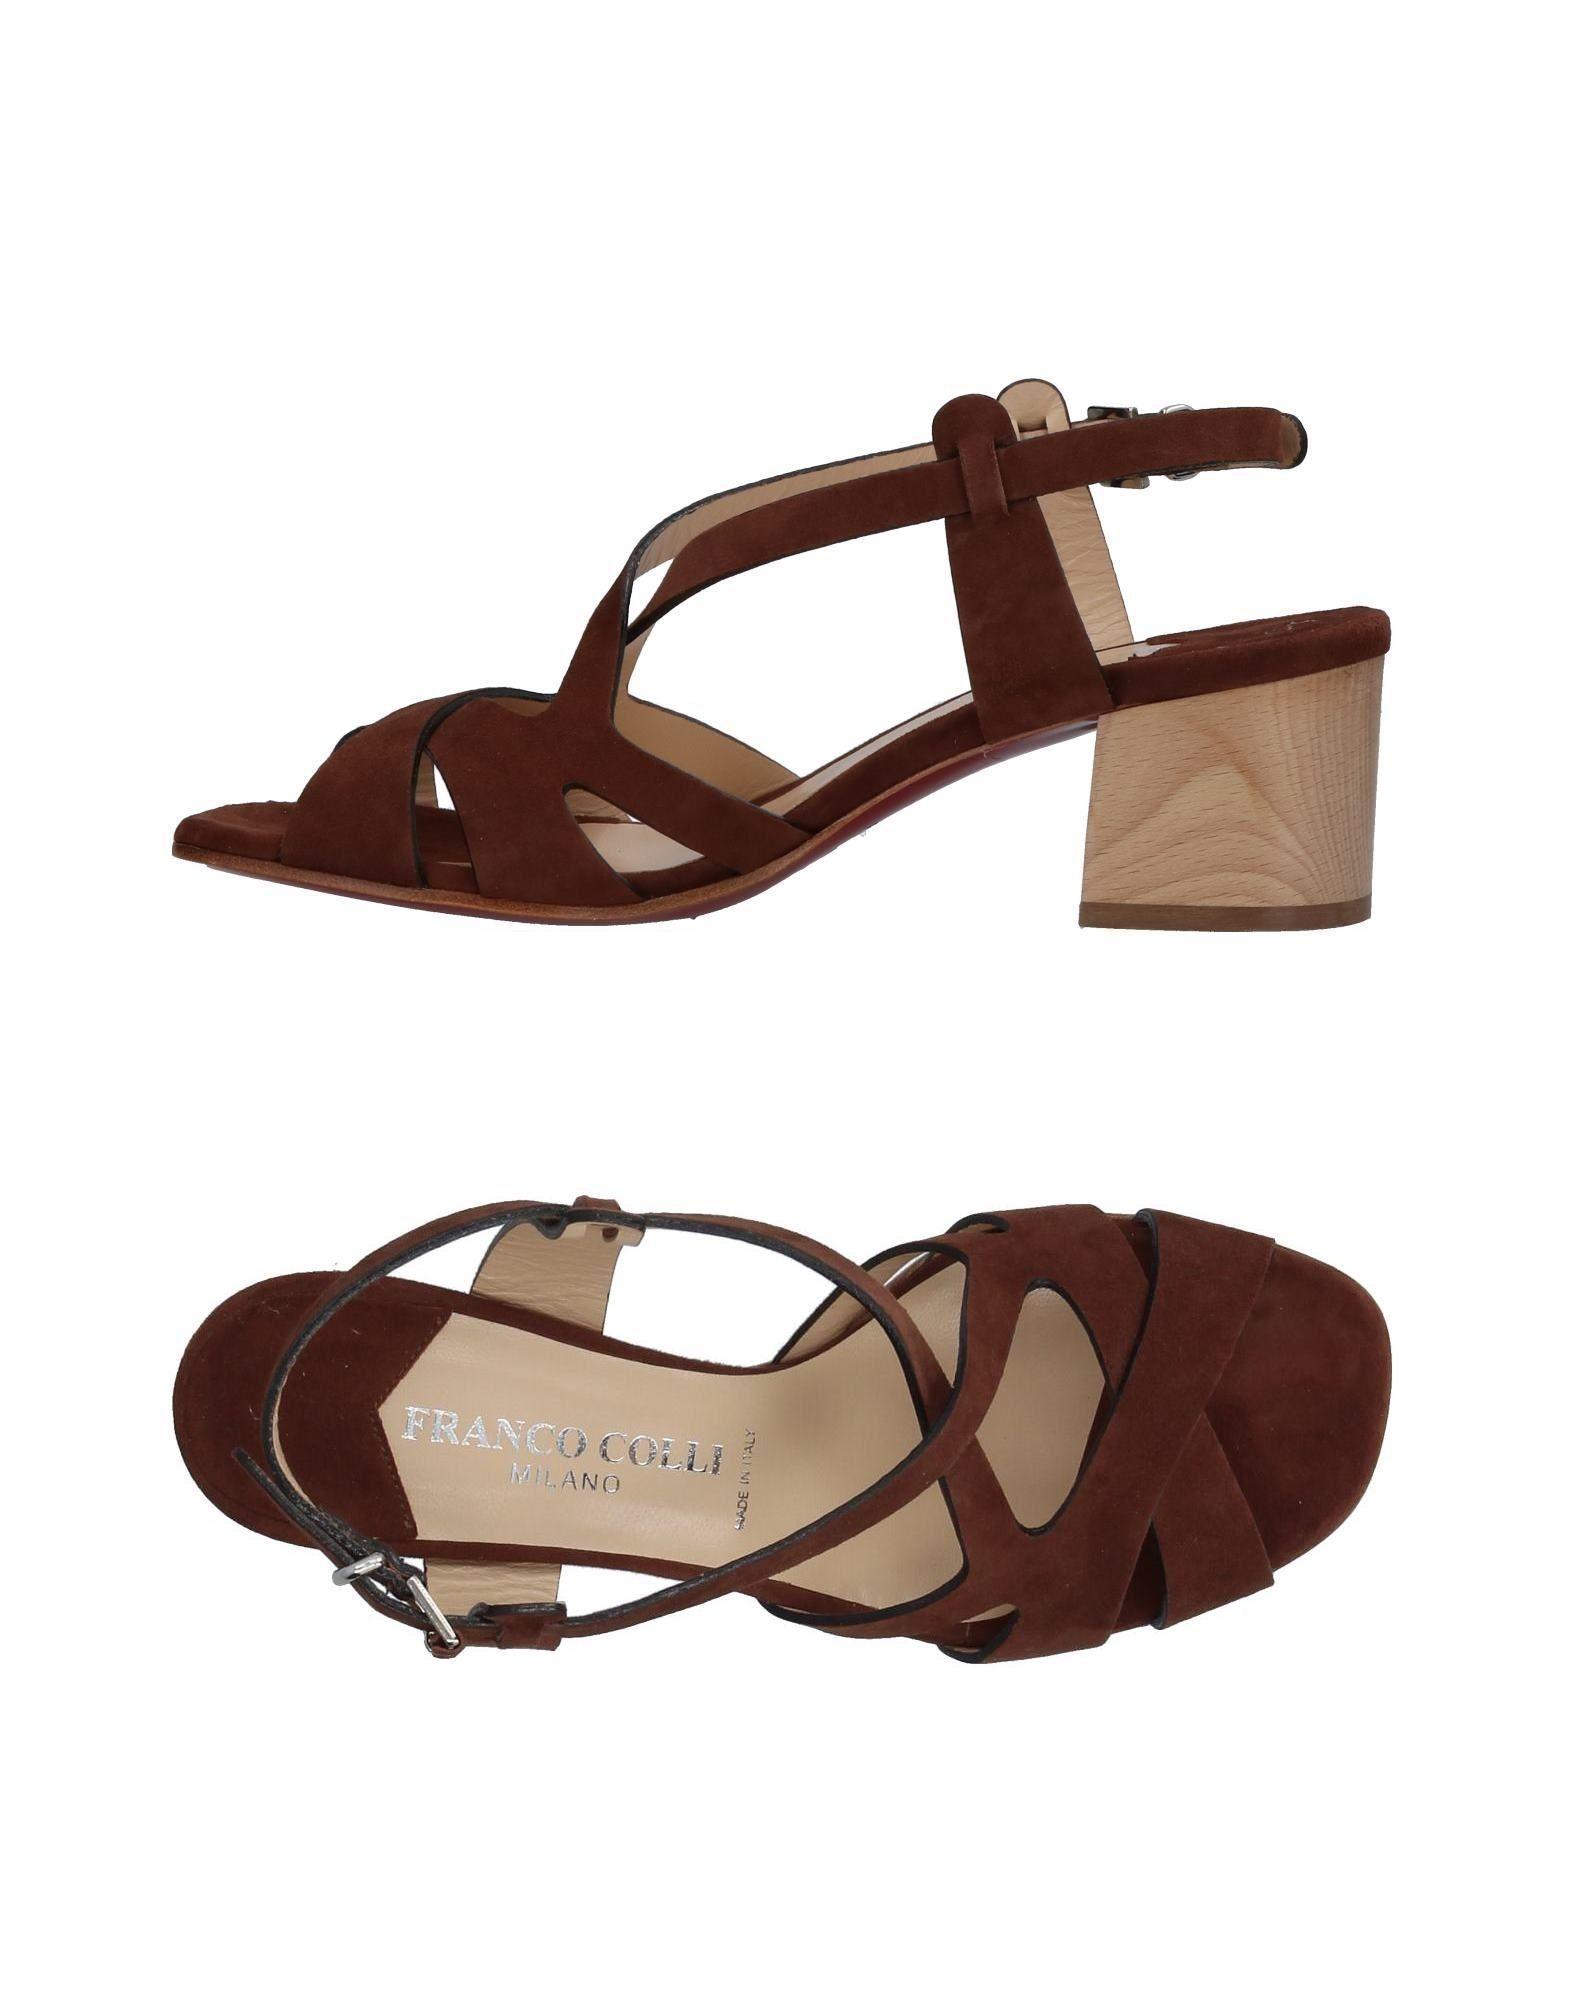 FOOTWEAR - Sandals FRANCO COLLI bHVr7s